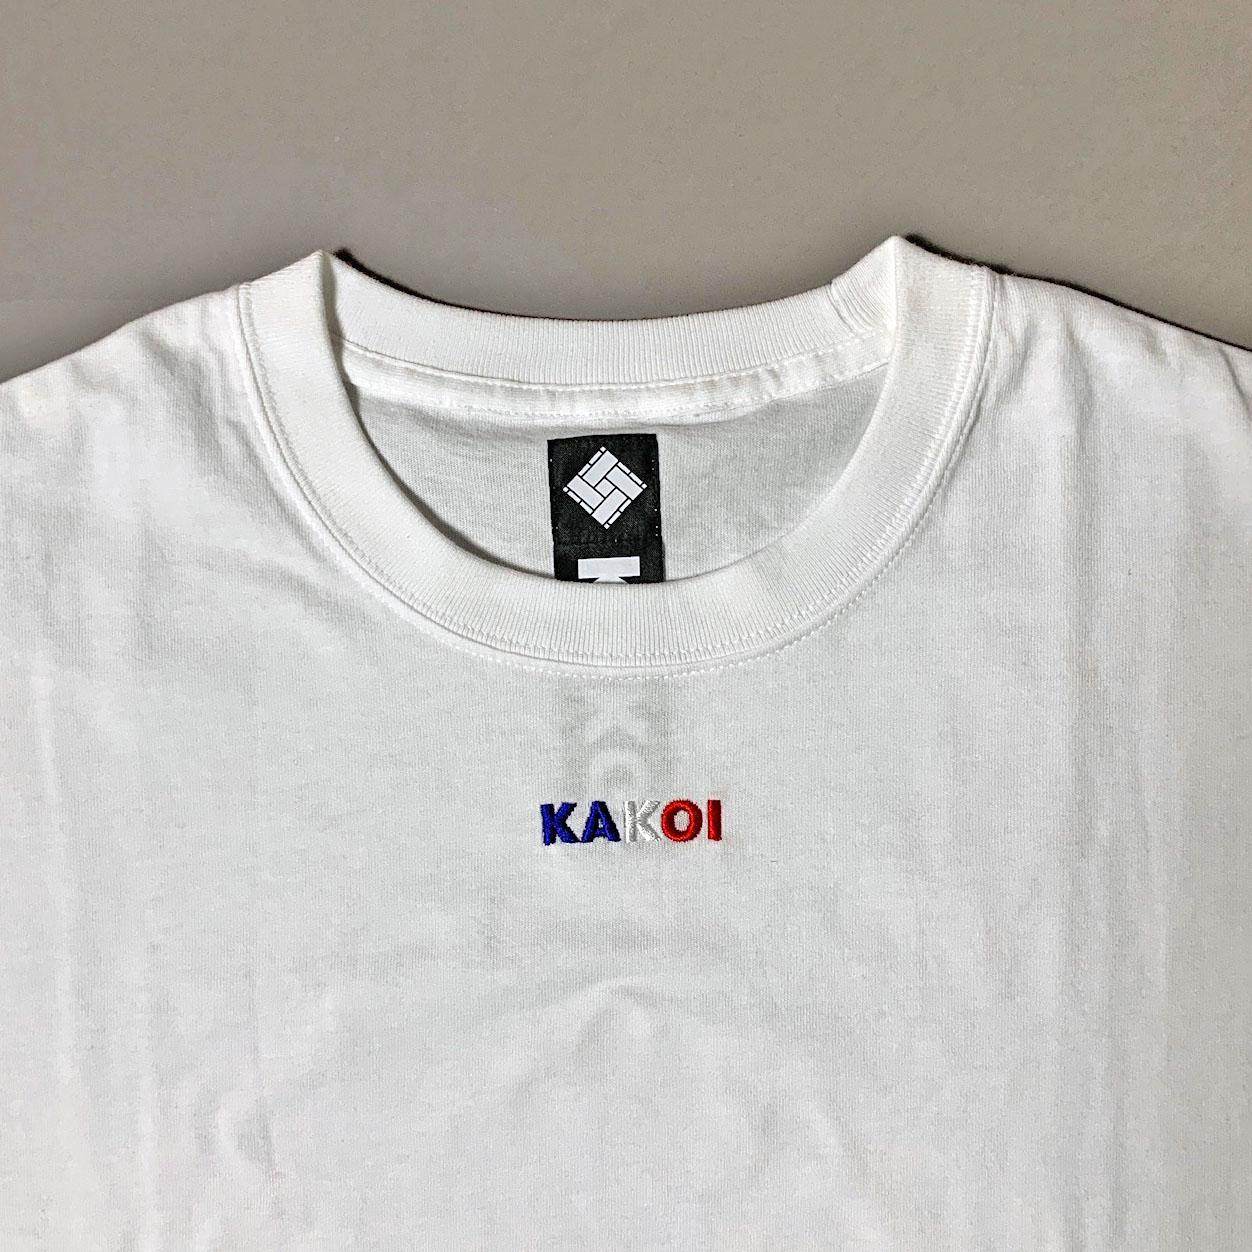 KKLS-004-WHT